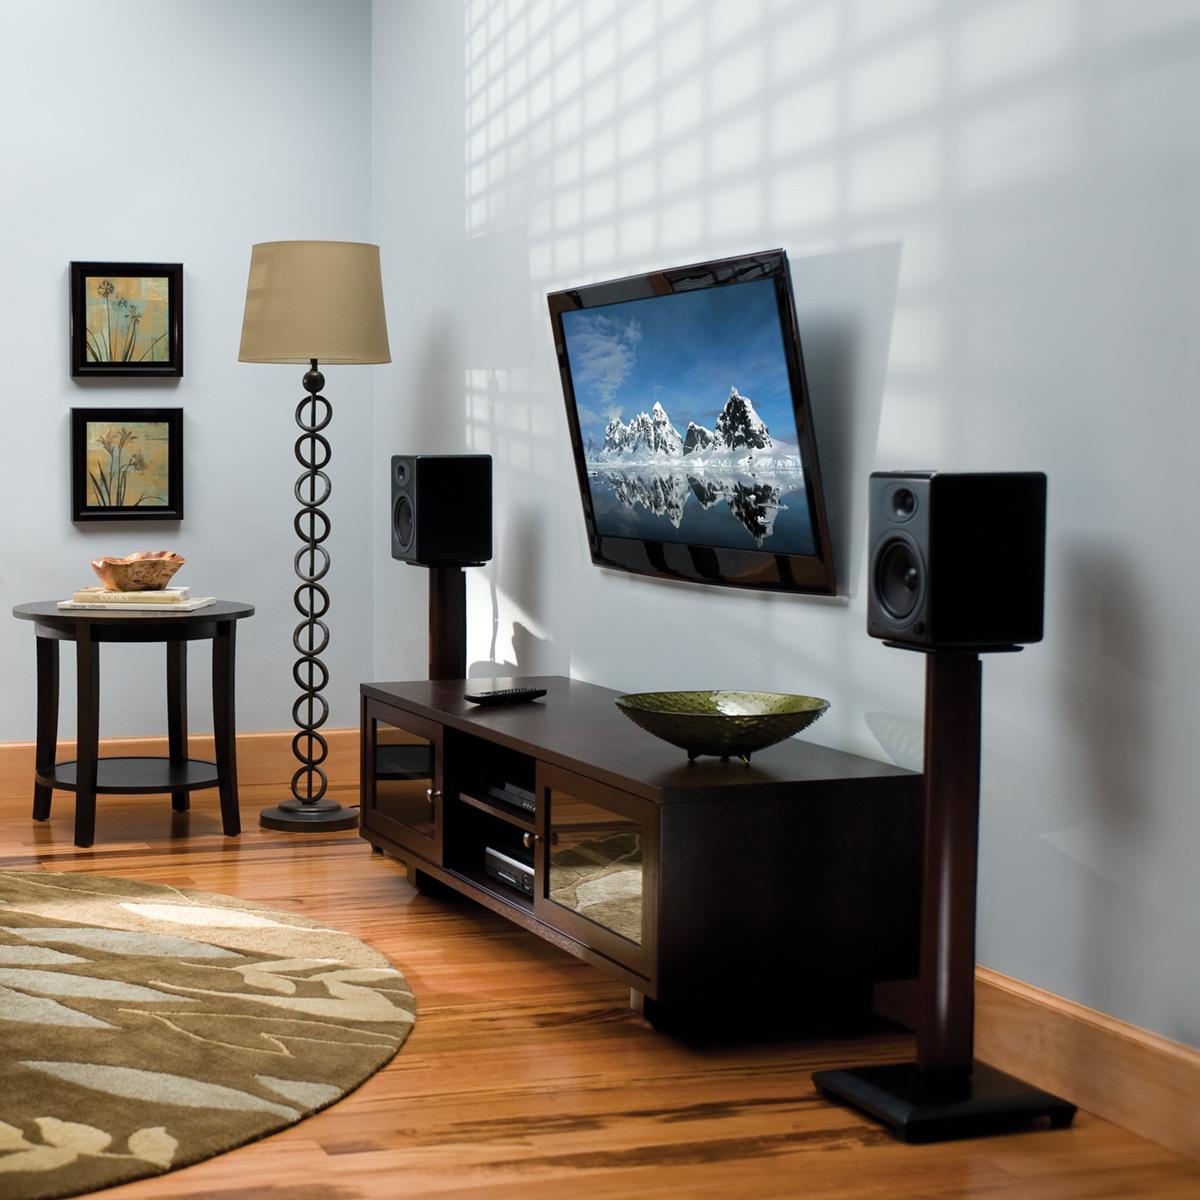 Audioengine-A5-Classic-Powered-Bookshelf-Speakers-Pair thumbnail 9